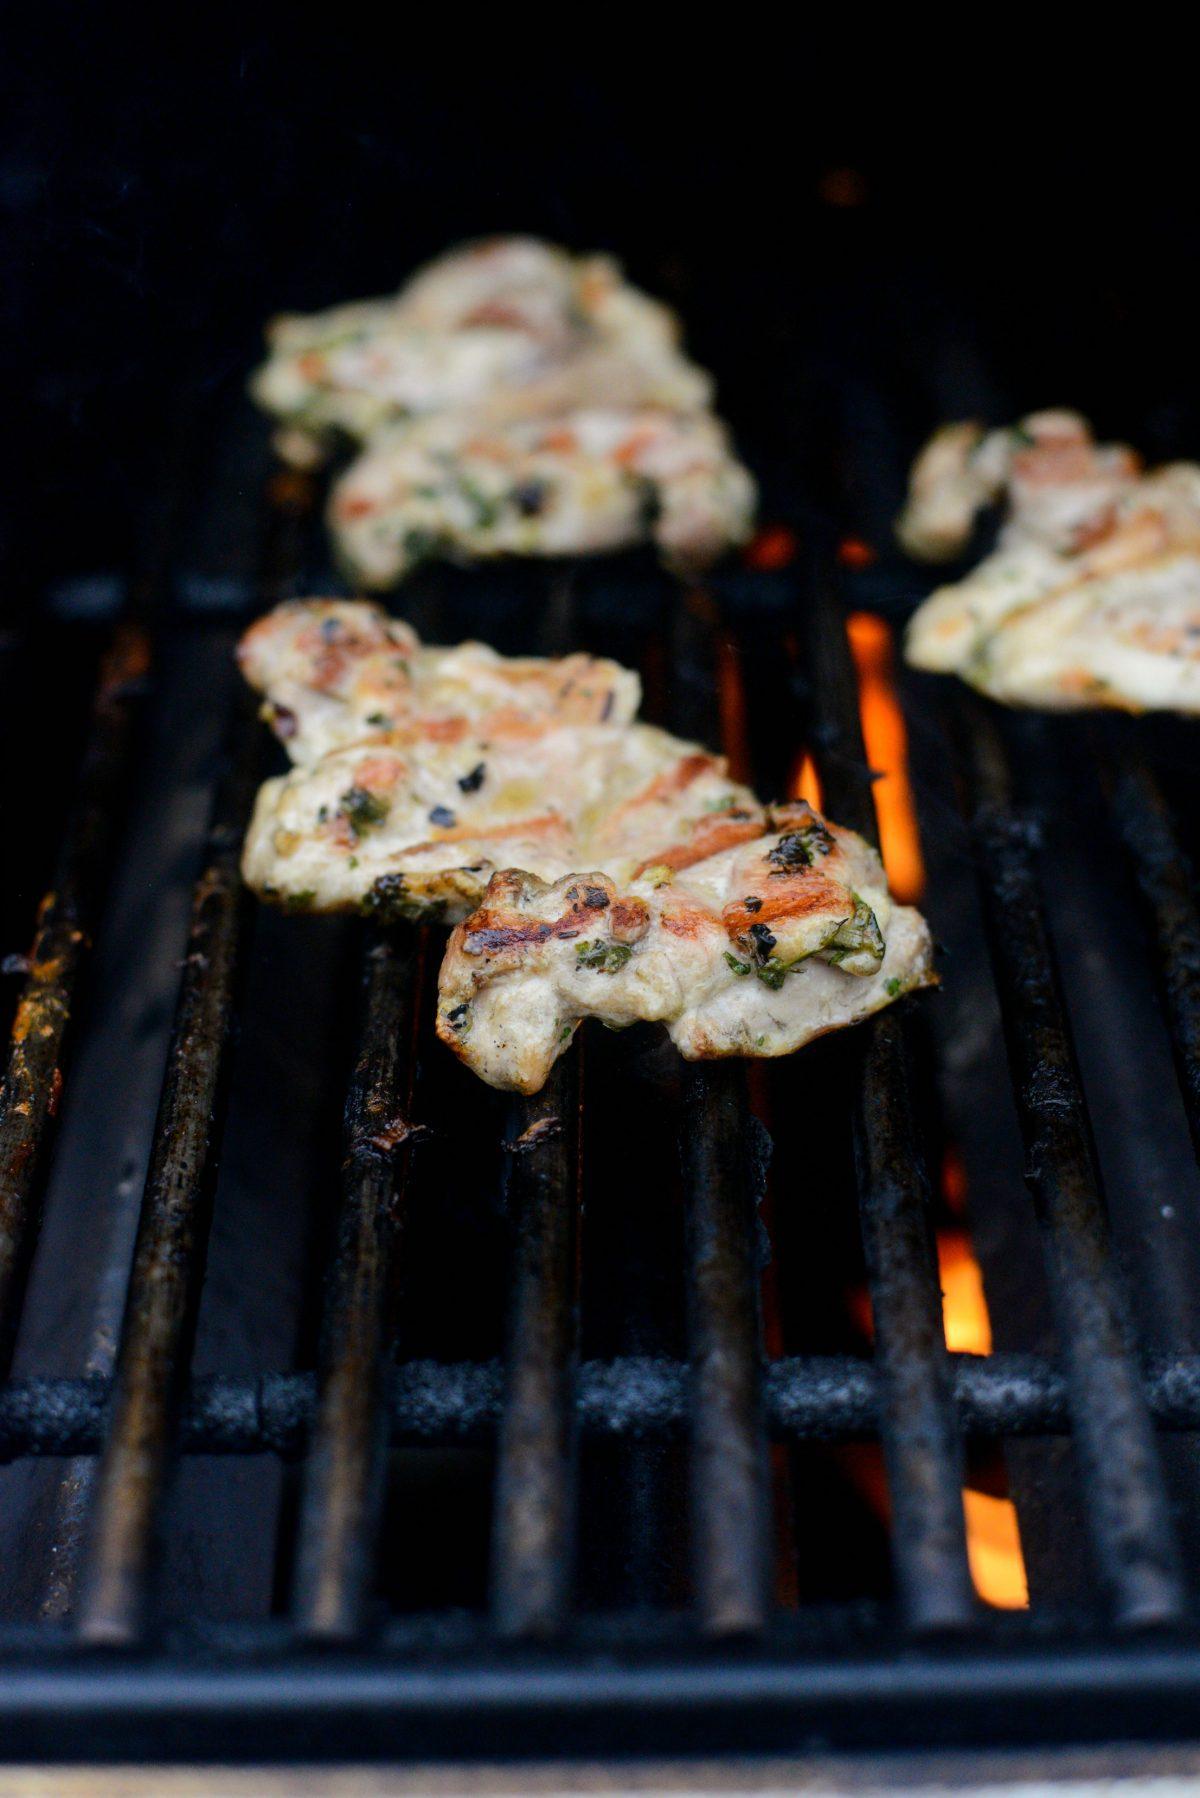 Cilantro Chimichurri Grilled Chicken l SimplyScratch.com